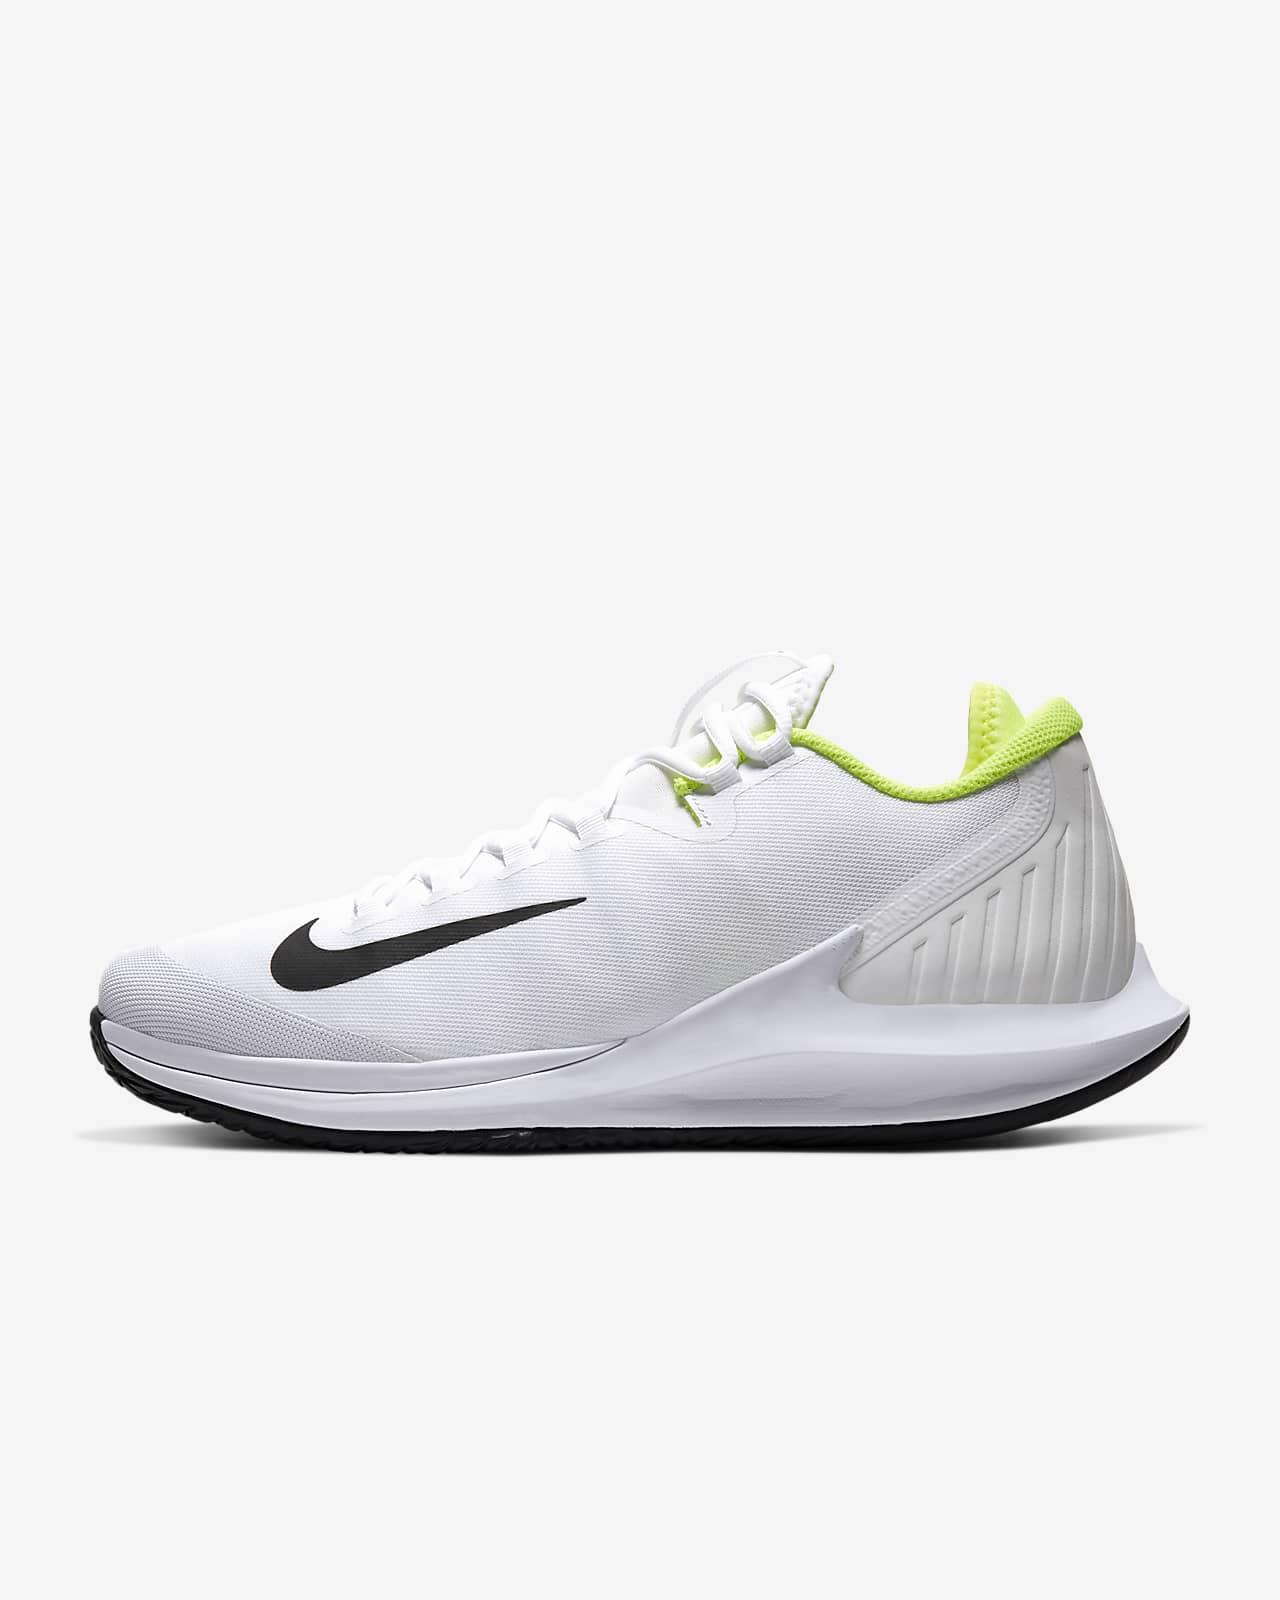 fecha límite Recogiendo hojas guía  NikeCourt Air Zoom Zero Men's Tennis Shoe. Nike HU